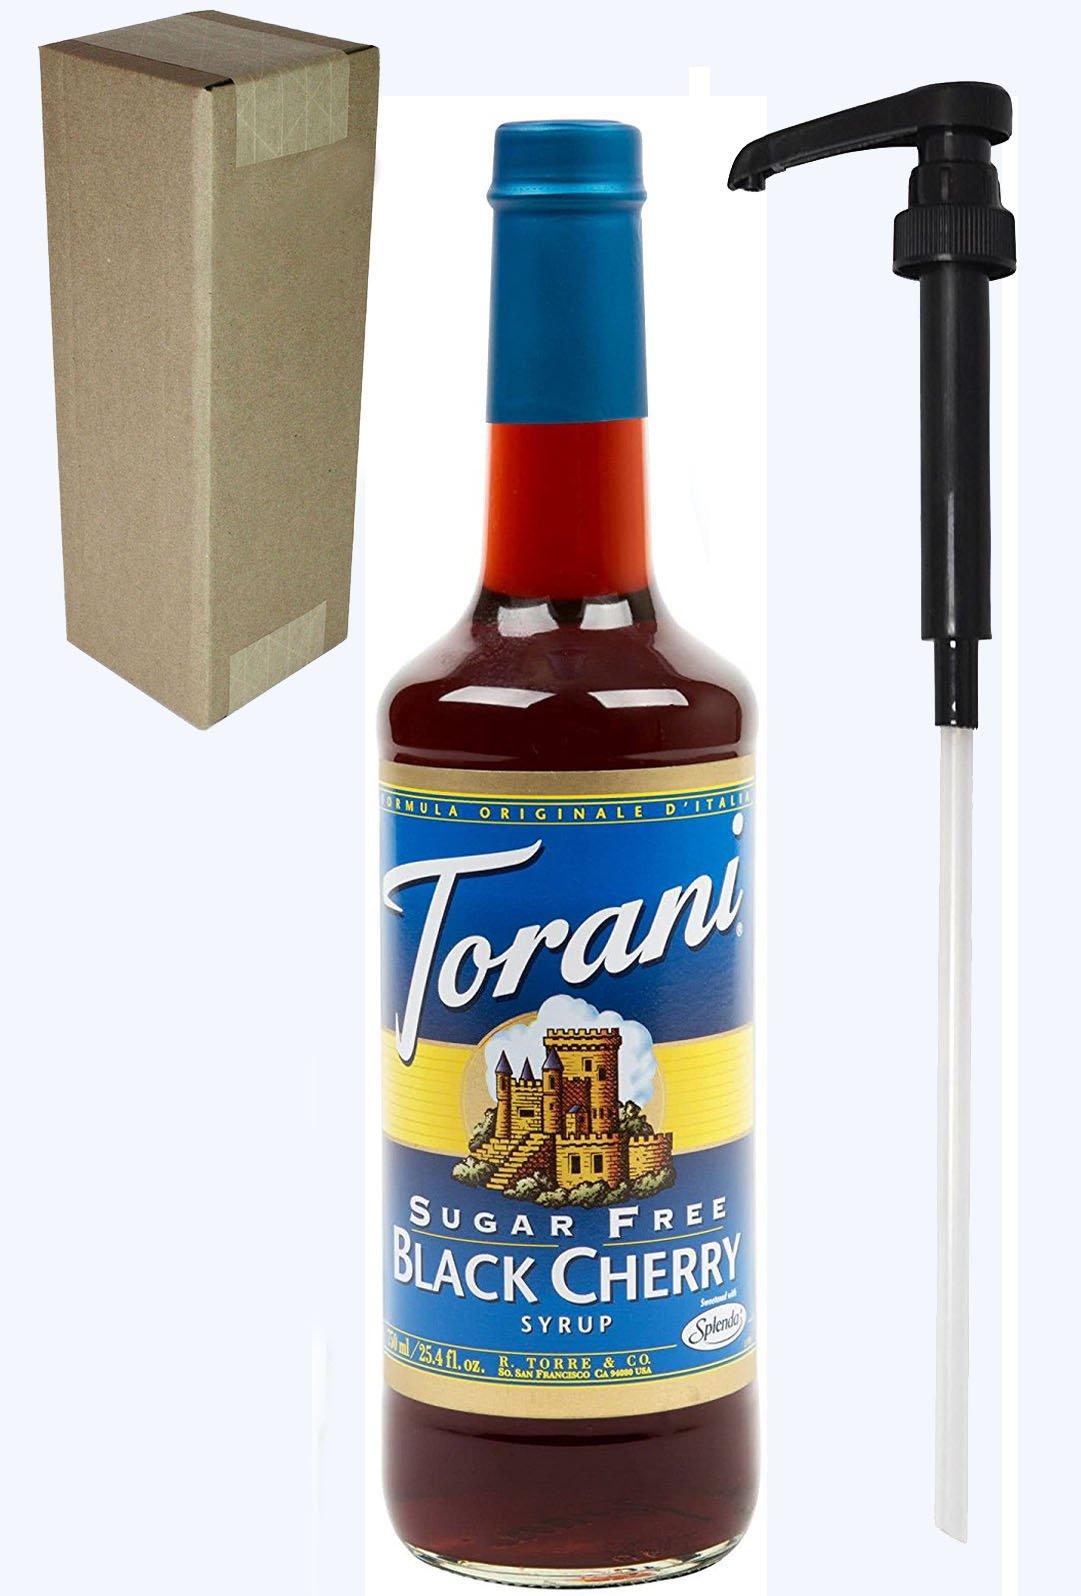 Torani Sugar Free Black Cherry Flavoring Syrup, 750mL (25.4 Fl Oz) Glass Bottle, Individually Boxed, With Black Pump